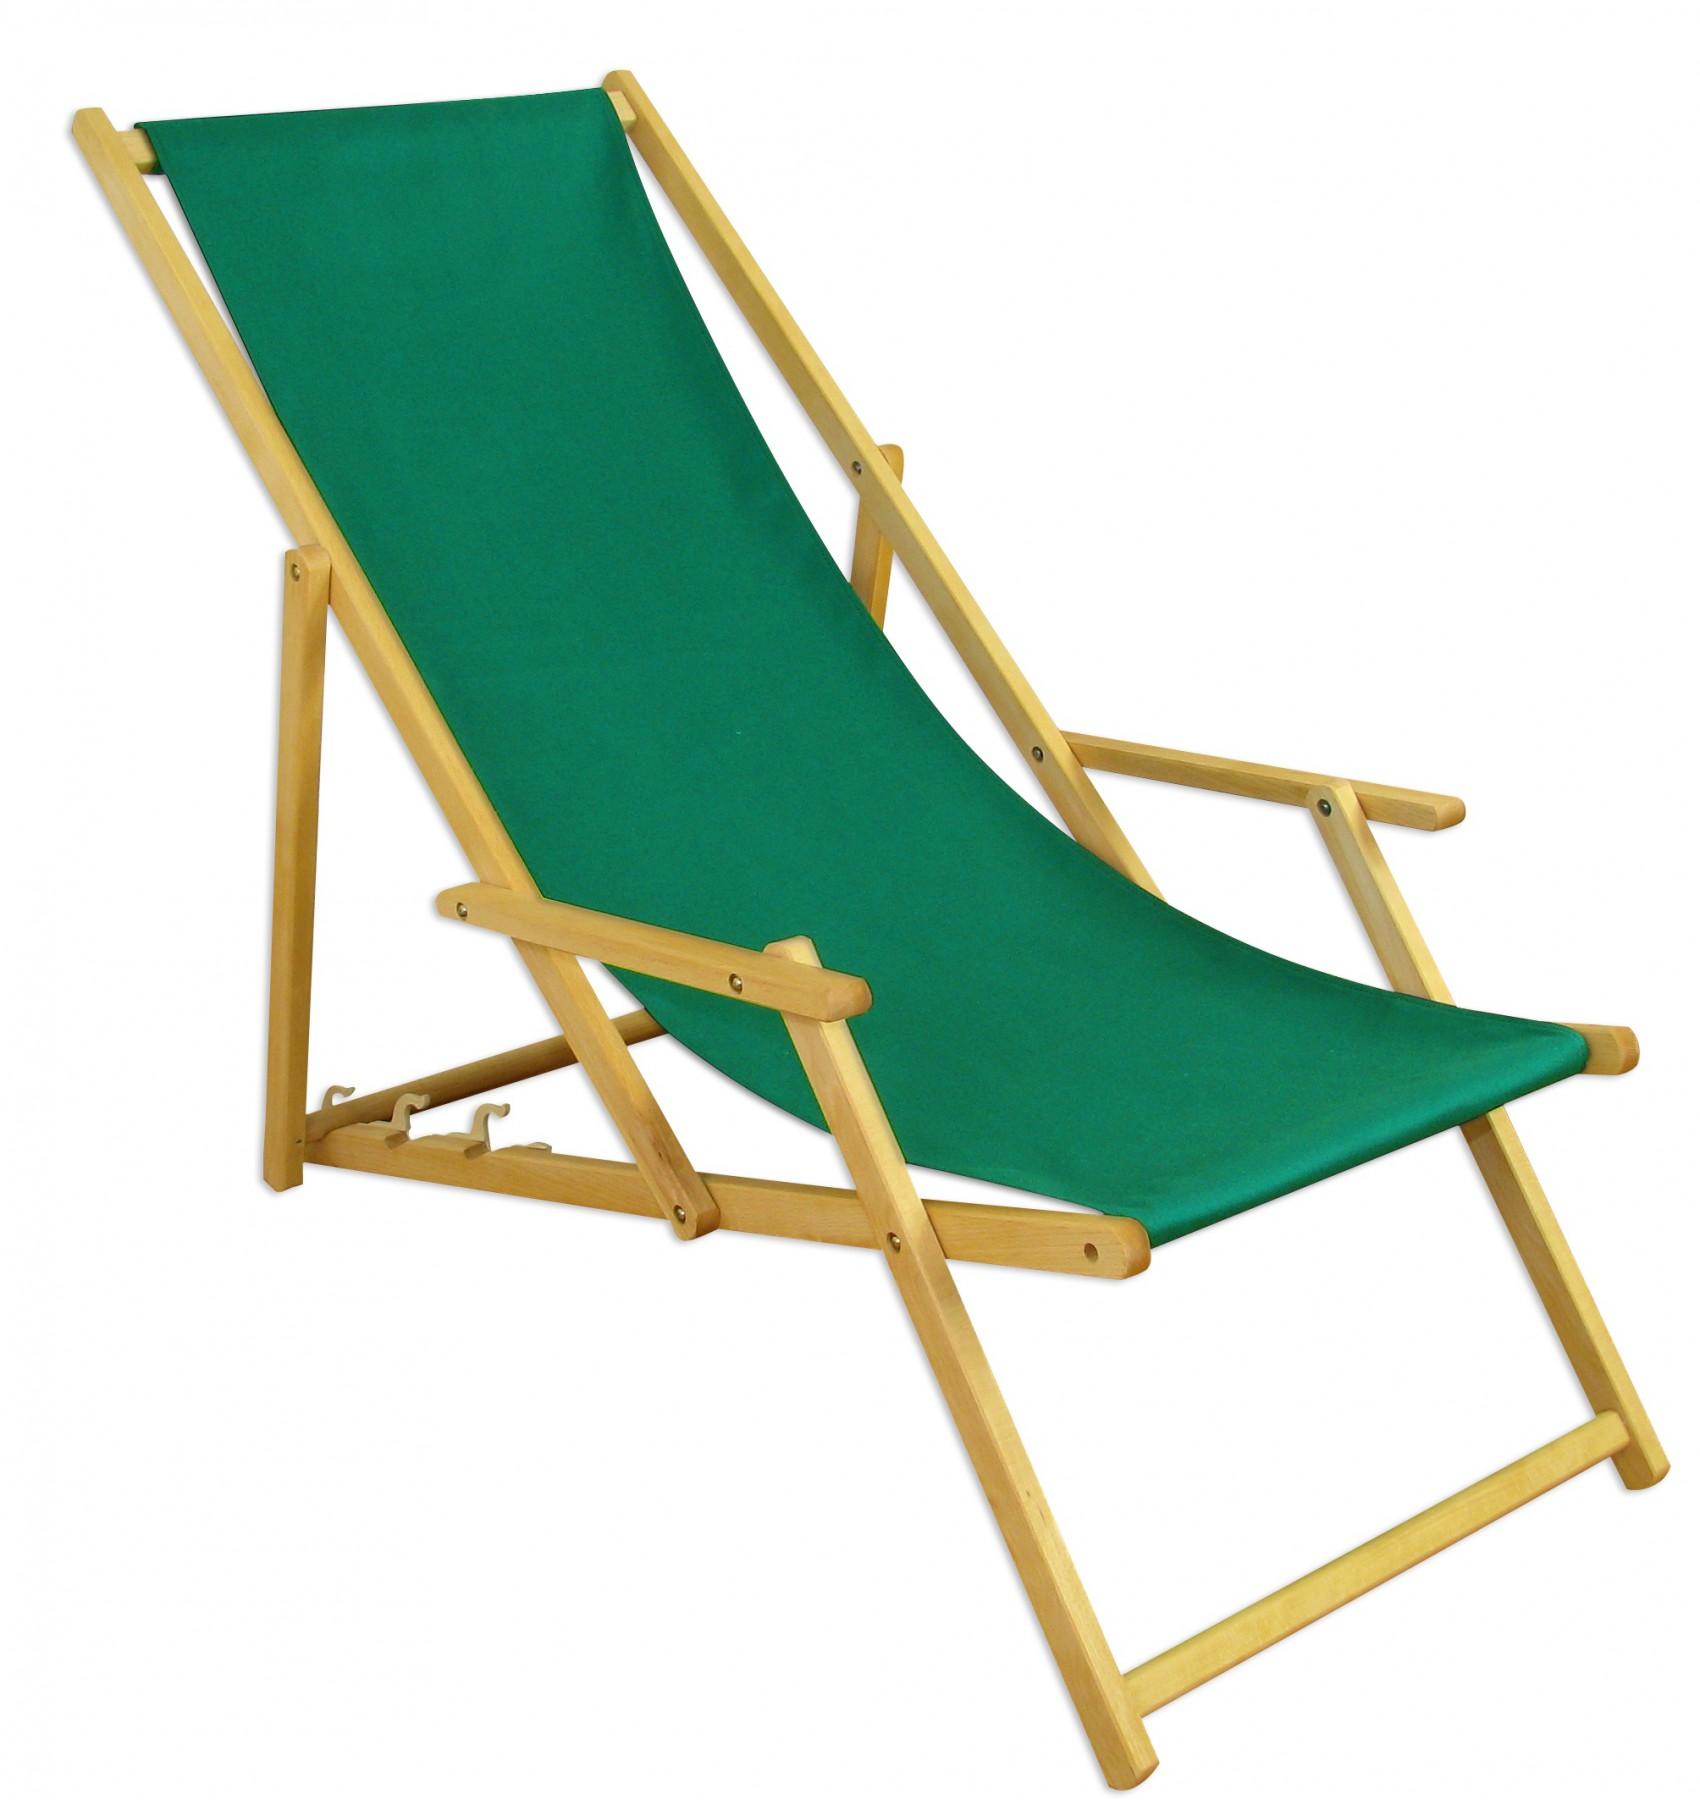 gartenliege sonnenliege gr n liegestuhl sonnendach. Black Bedroom Furniture Sets. Home Design Ideas